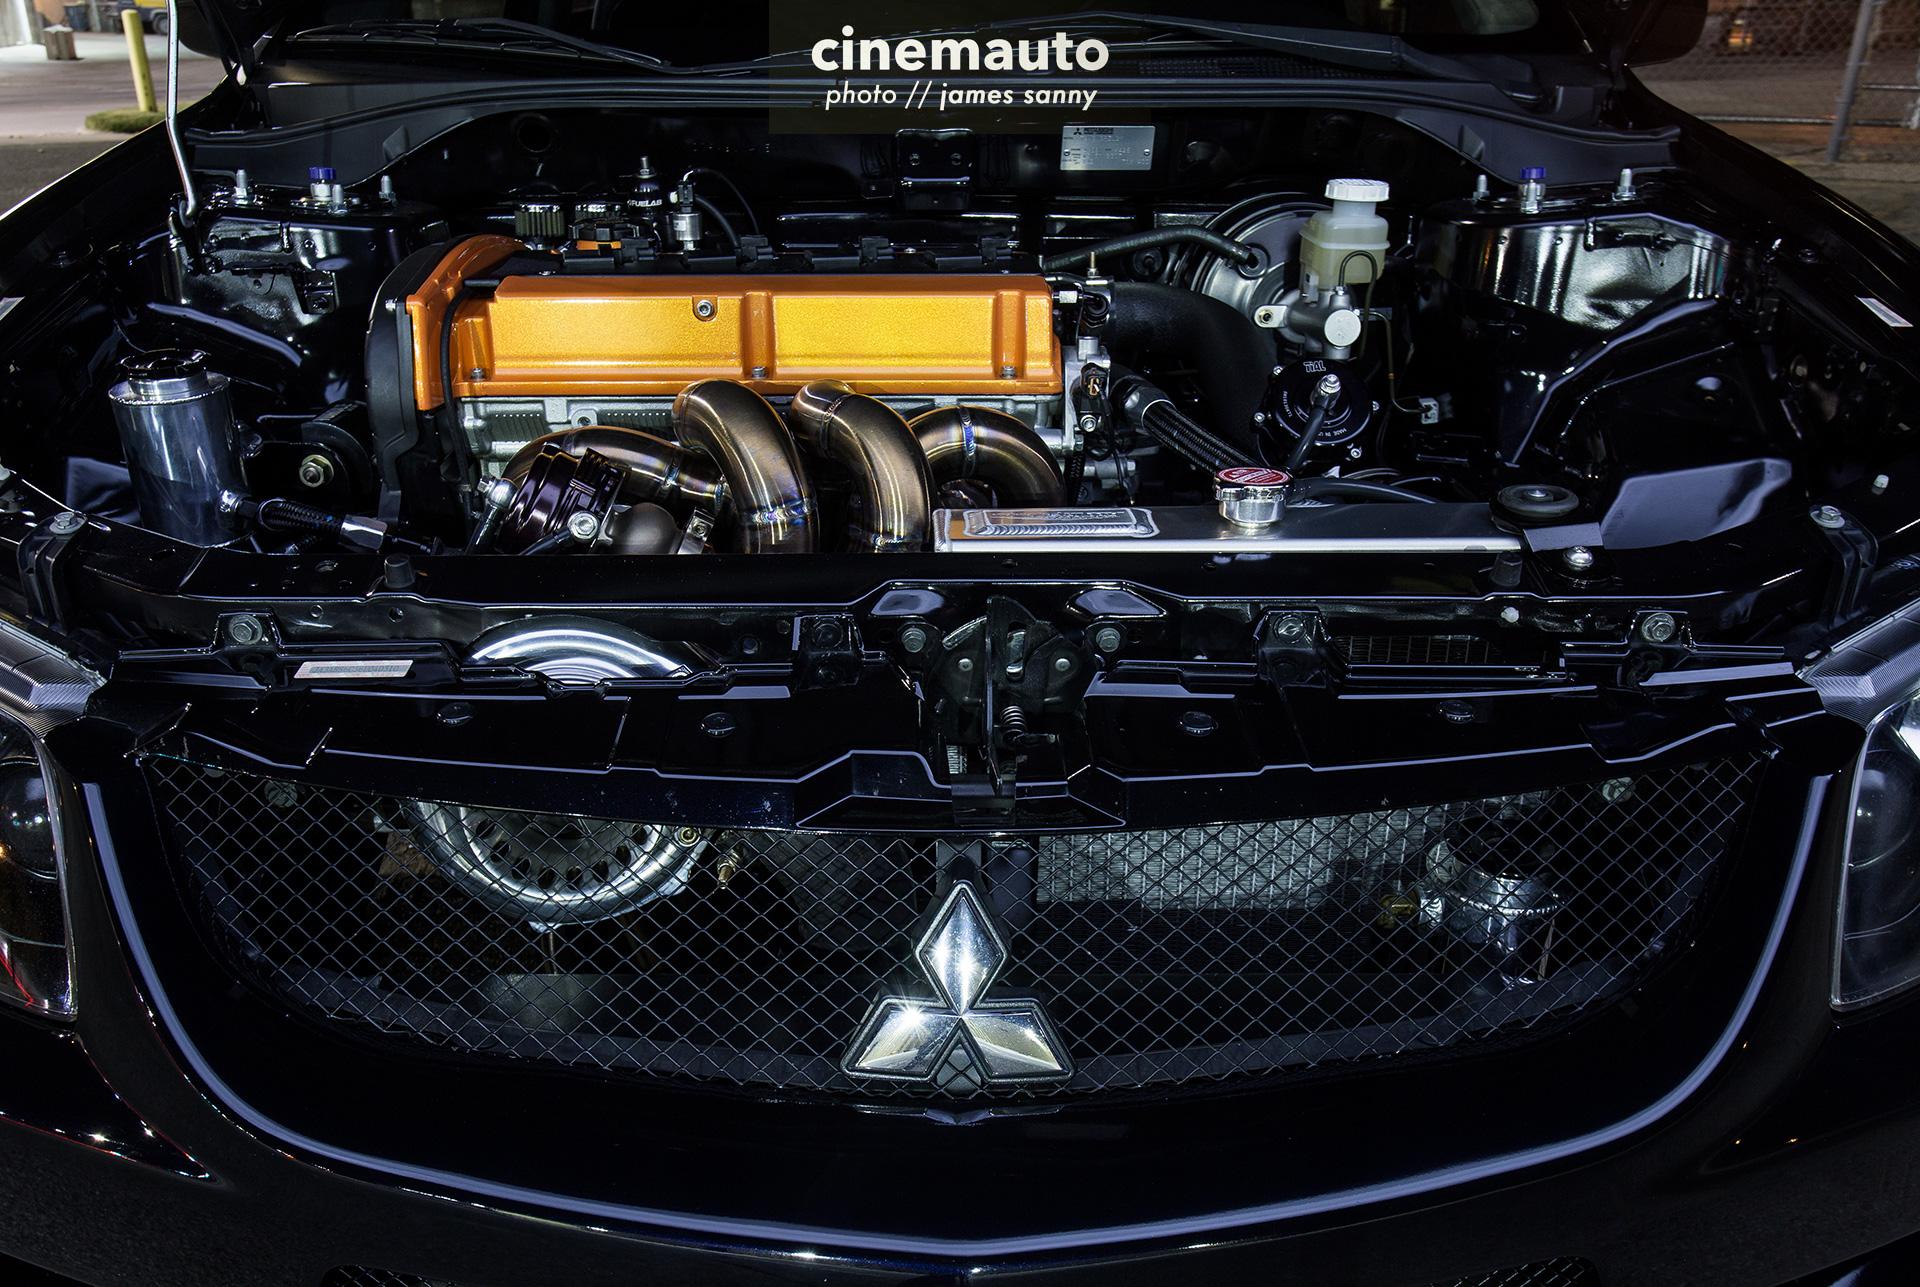 wichita-automotive-photographer-cinemauto-james-sanny-tj6sm.jpg